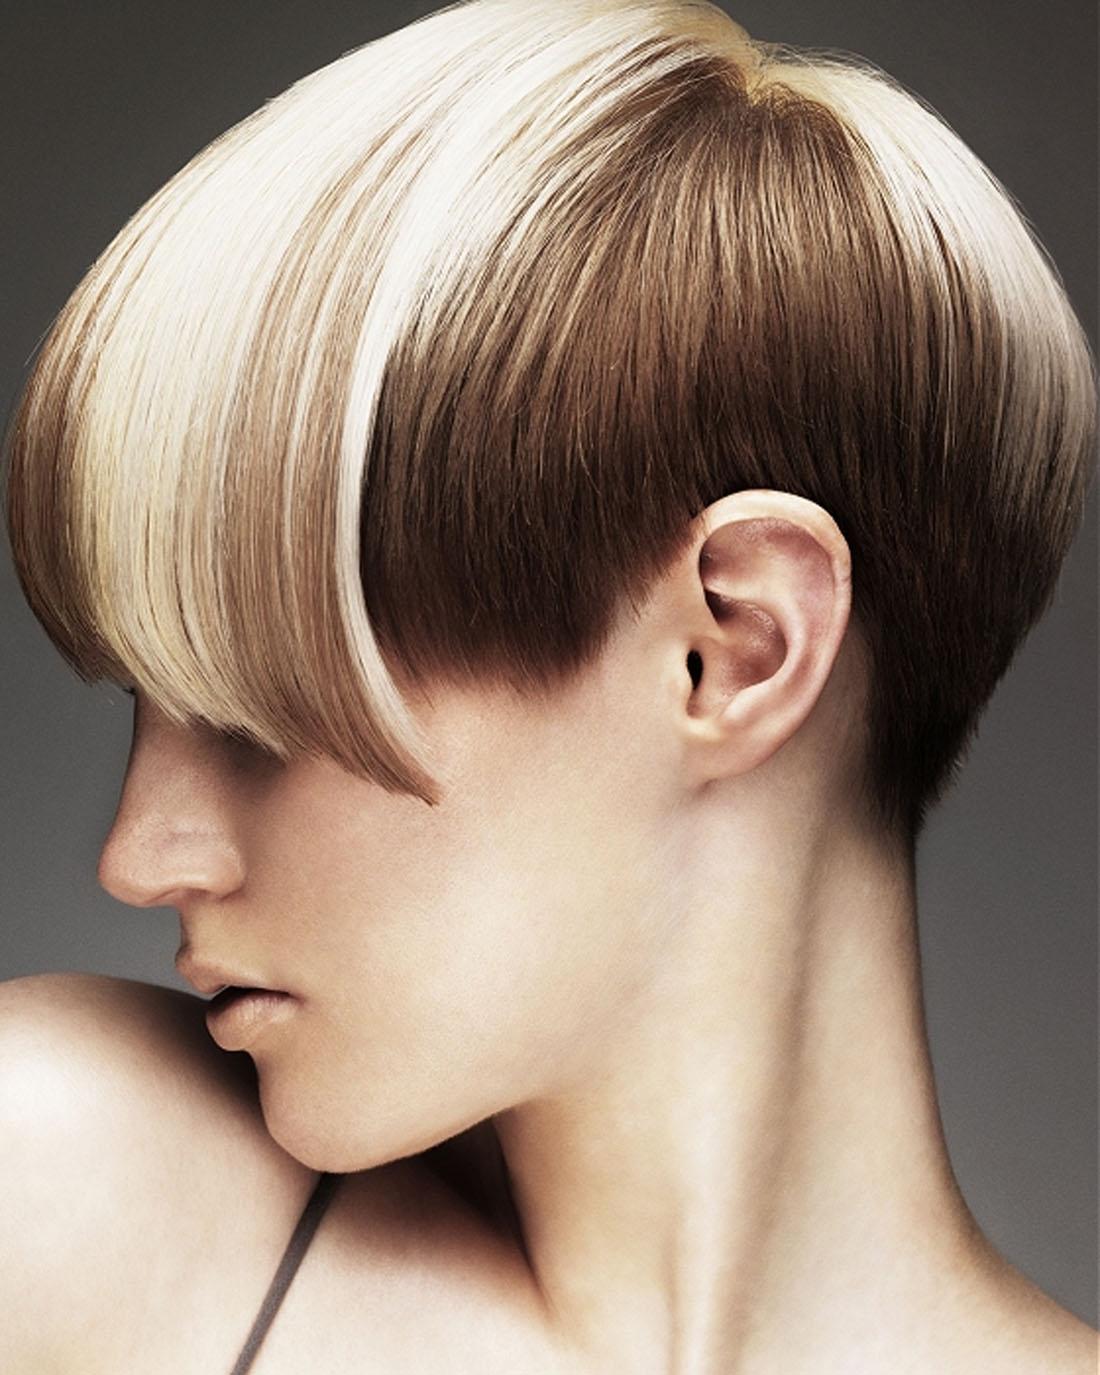 Astonishing Hair Color Short Hairstyles Short Hairstyles For Women And Man Short Hairstyles Gunalazisus